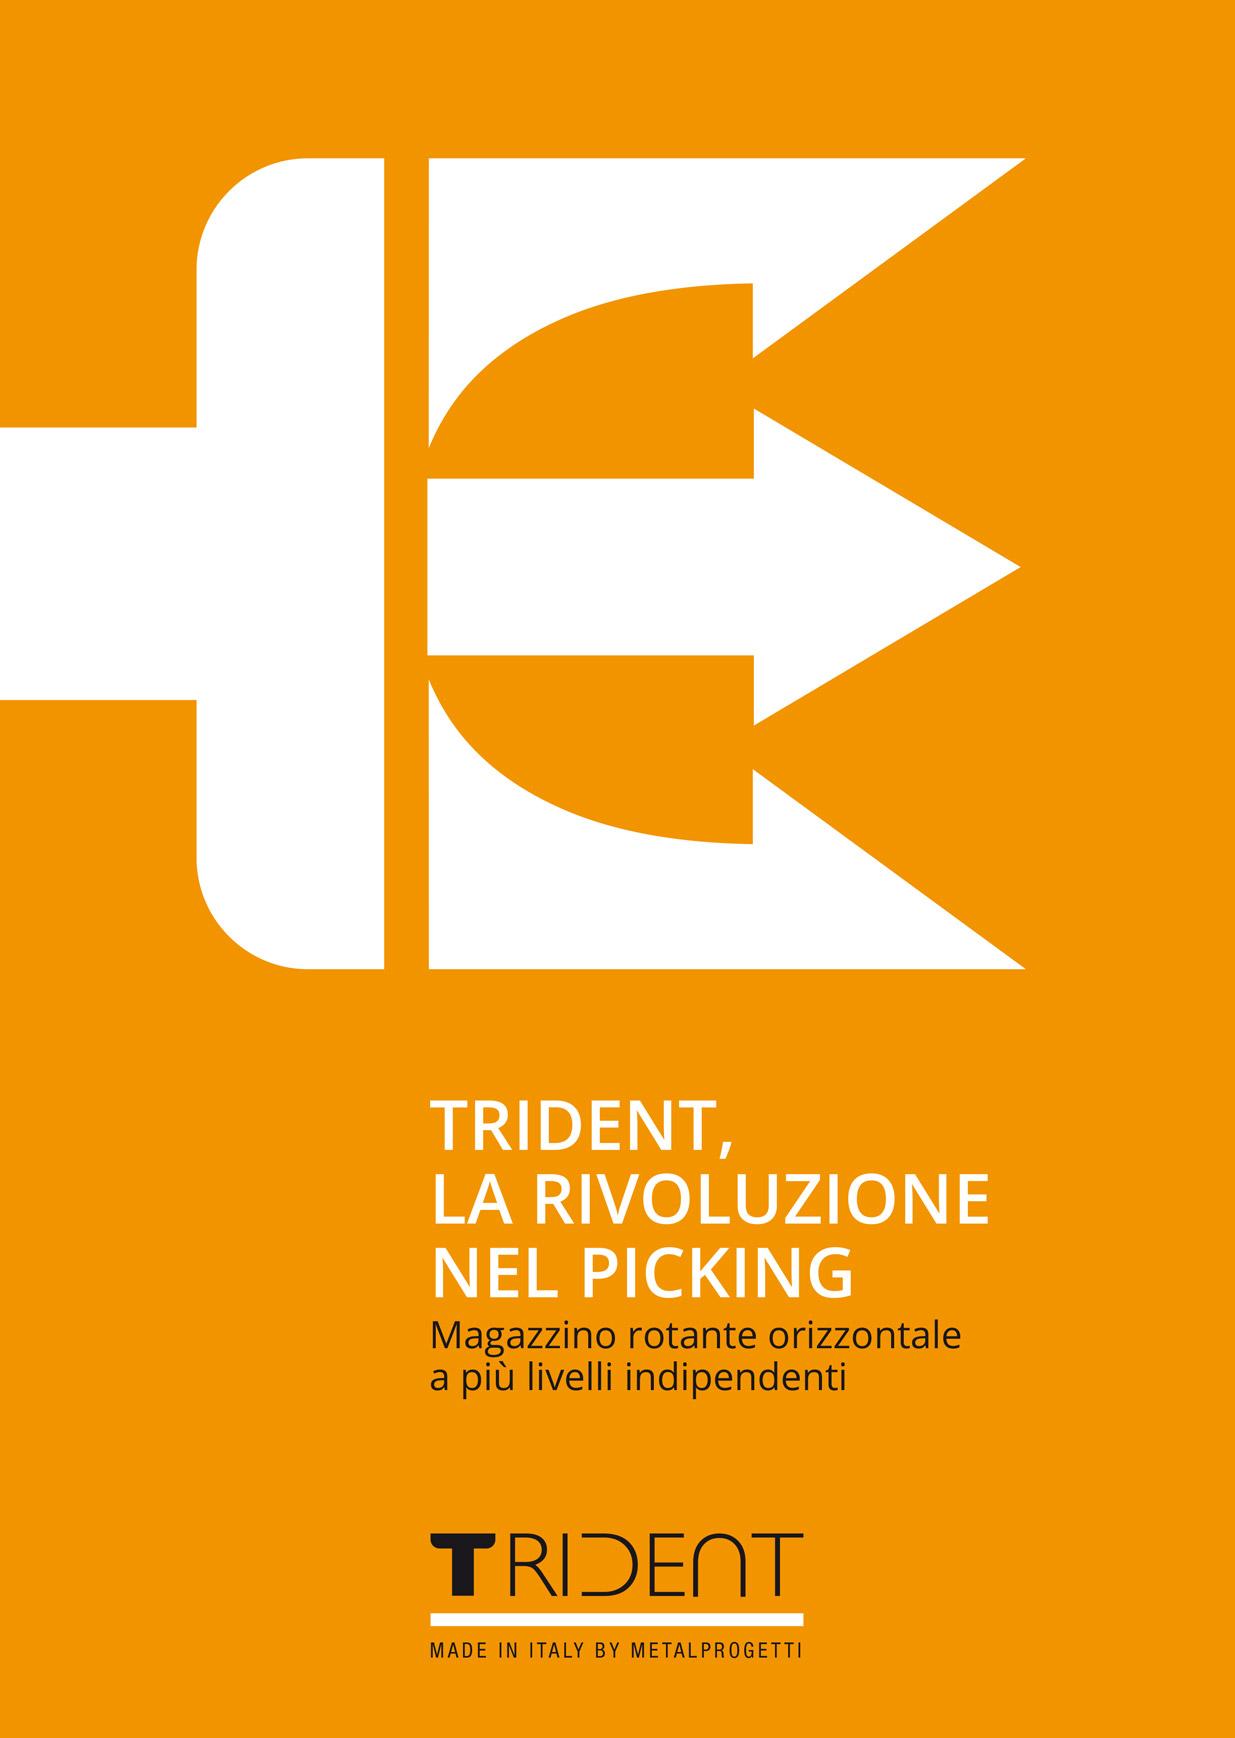 copertina_catalogo_trident